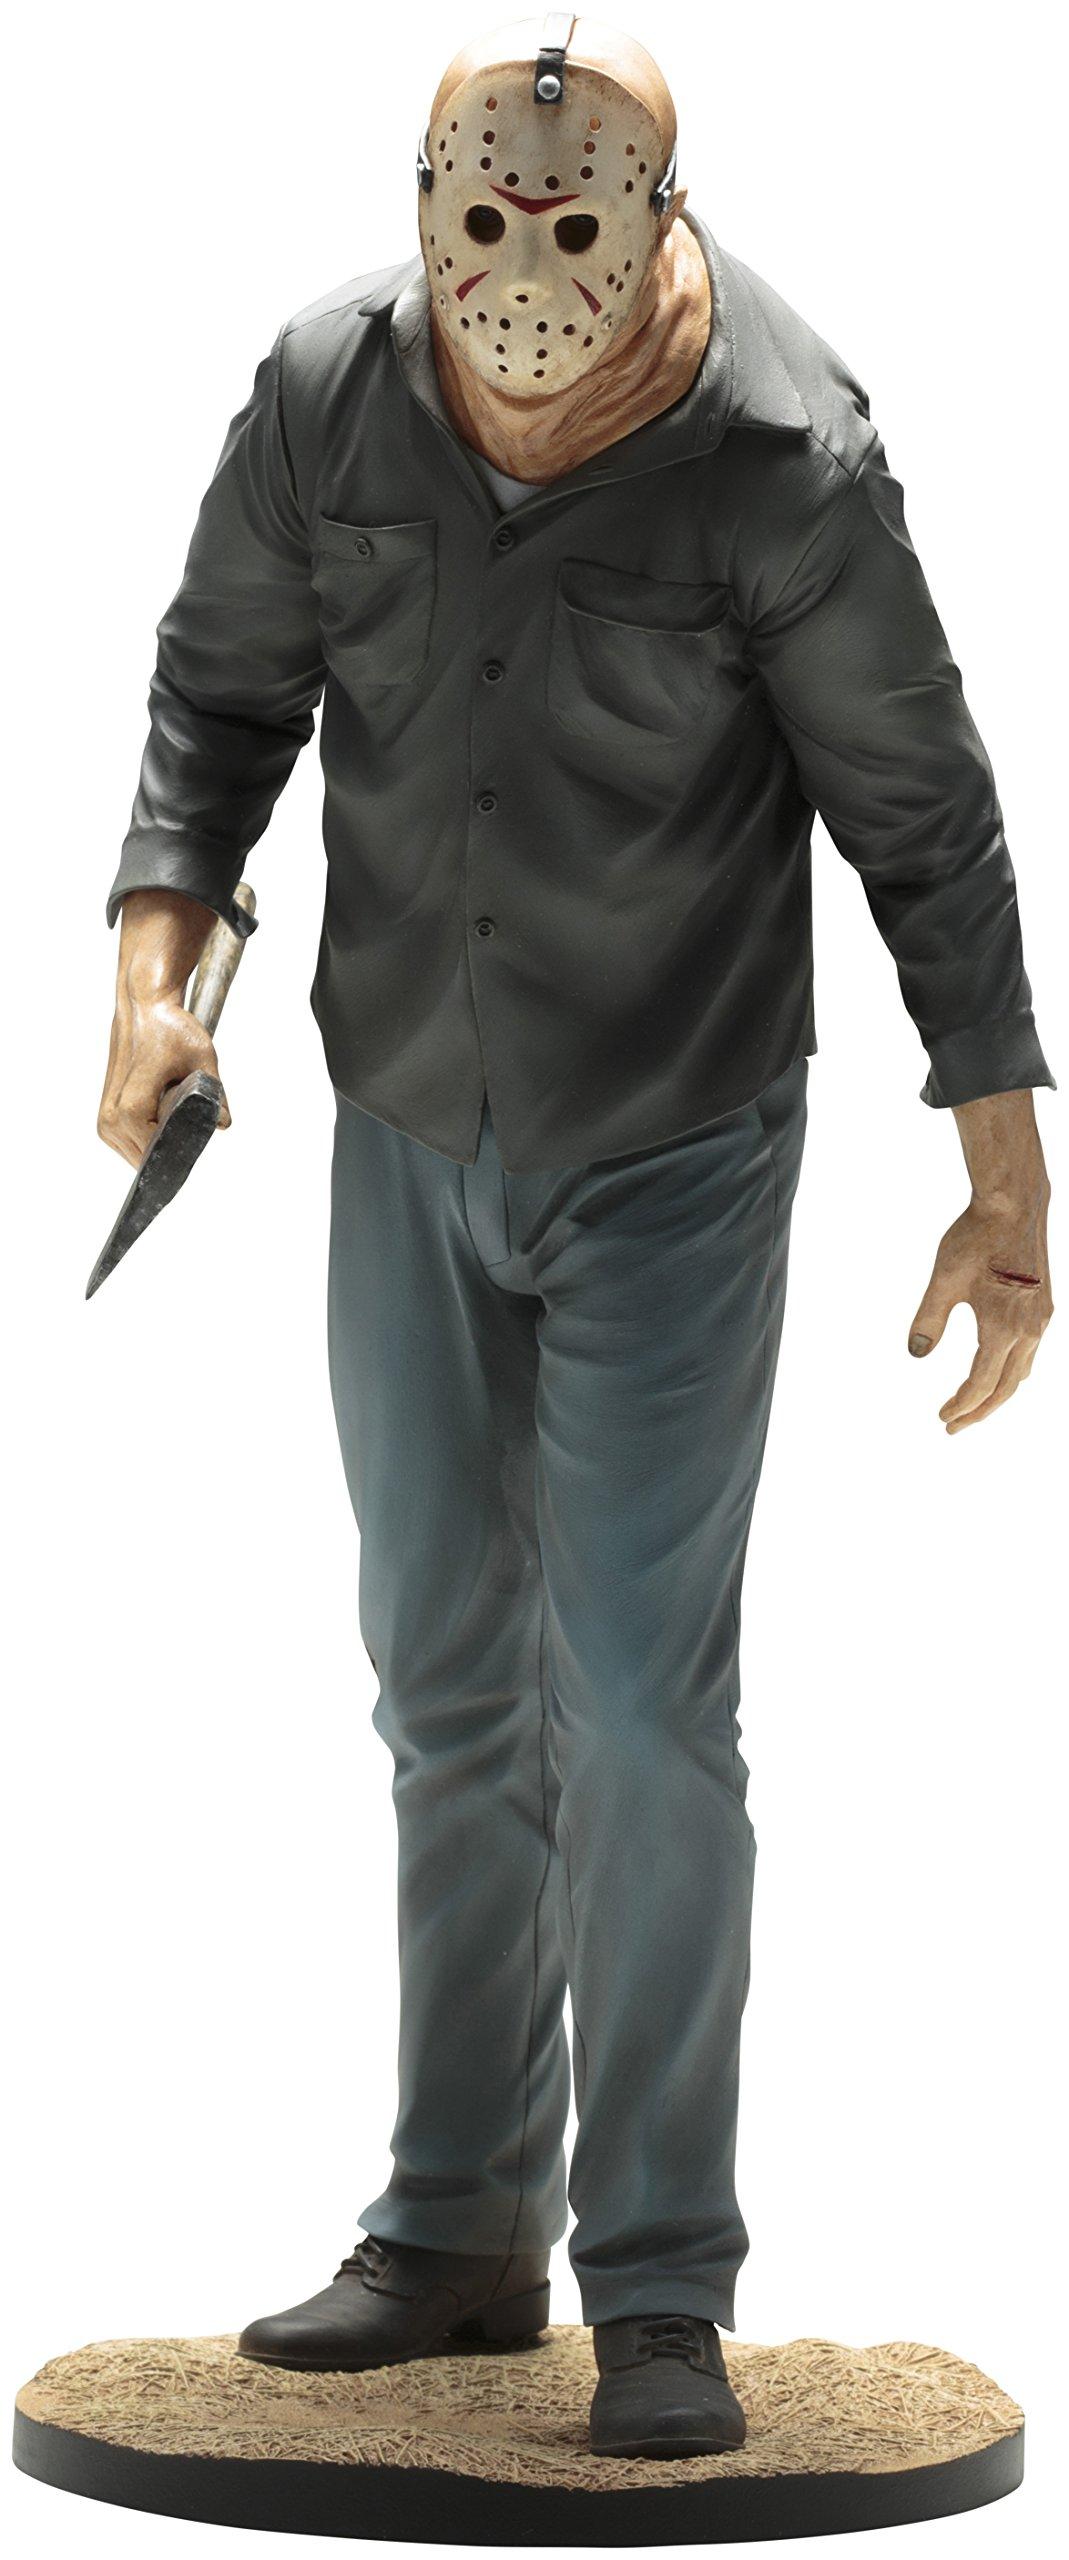 Kotobukiya Friday the 13th Jason Voorhees ArtFX Statue